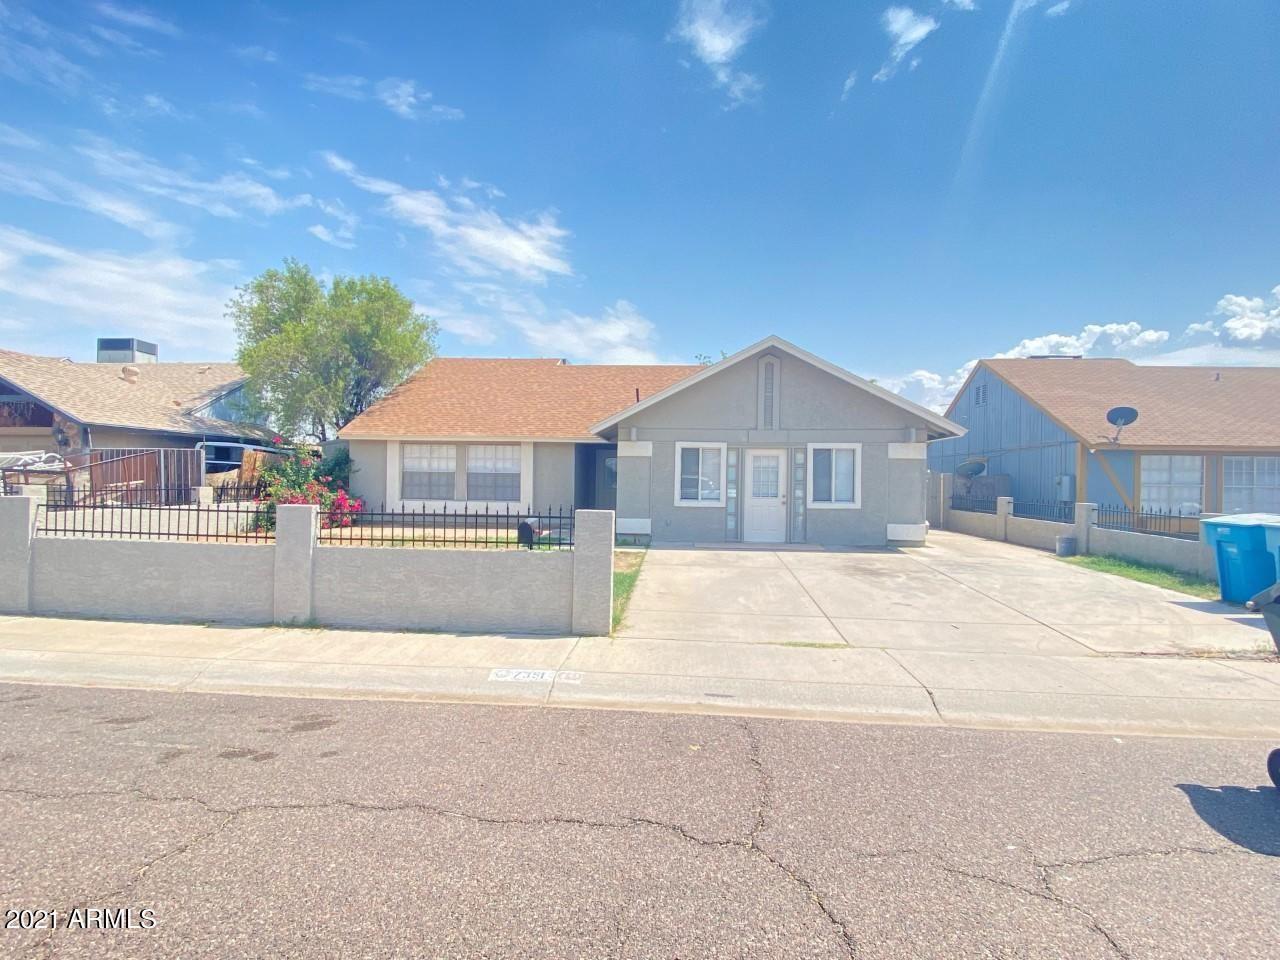 7351 W COOLIDGE Street, Phoenix, AZ 85033 - MLS#: 6267862